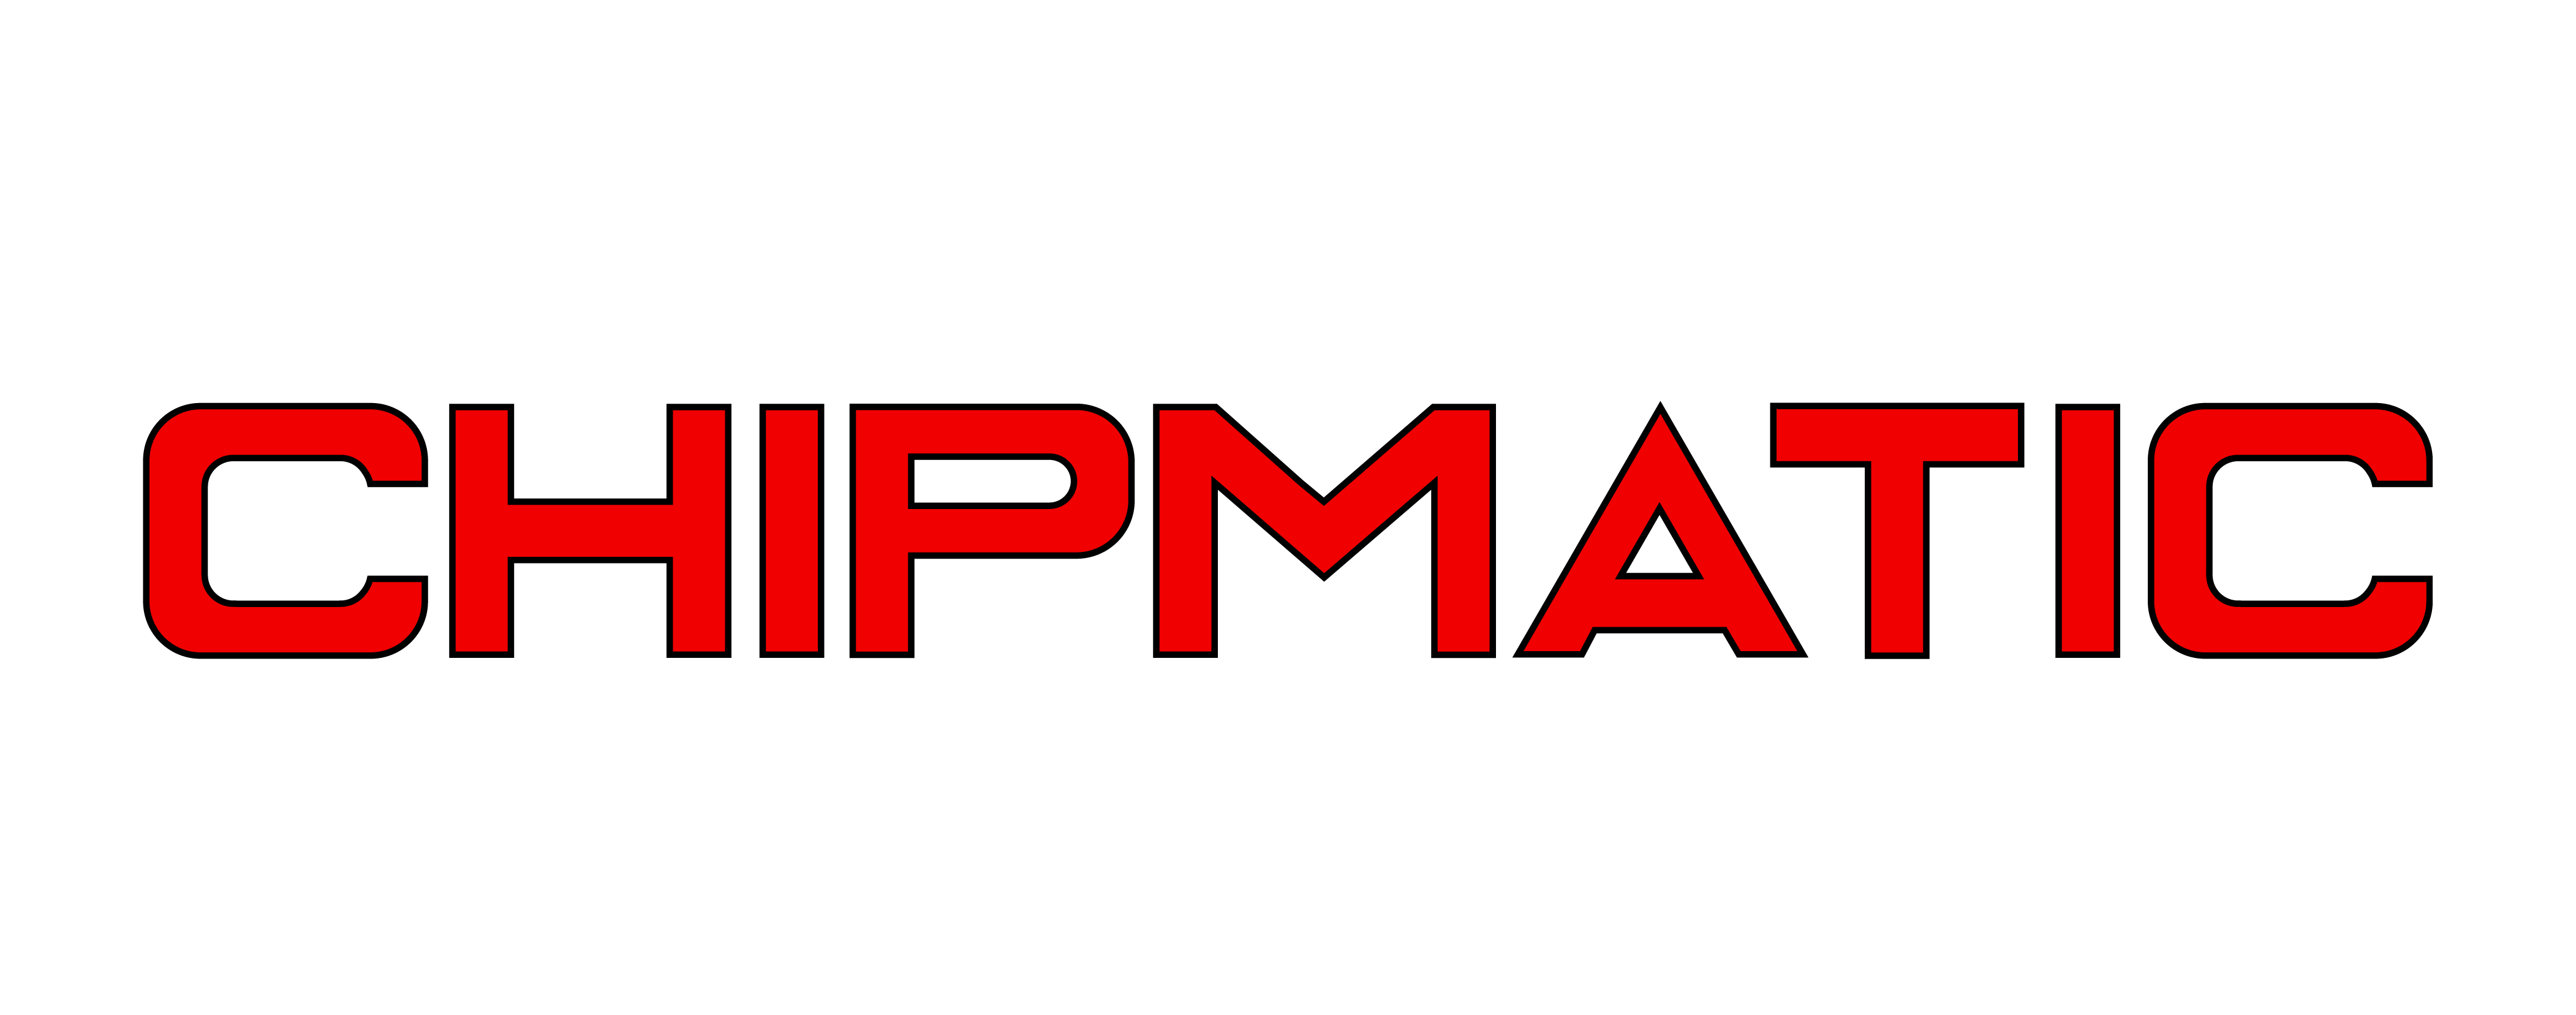 THE CHIPMATIC COMPANY Logo